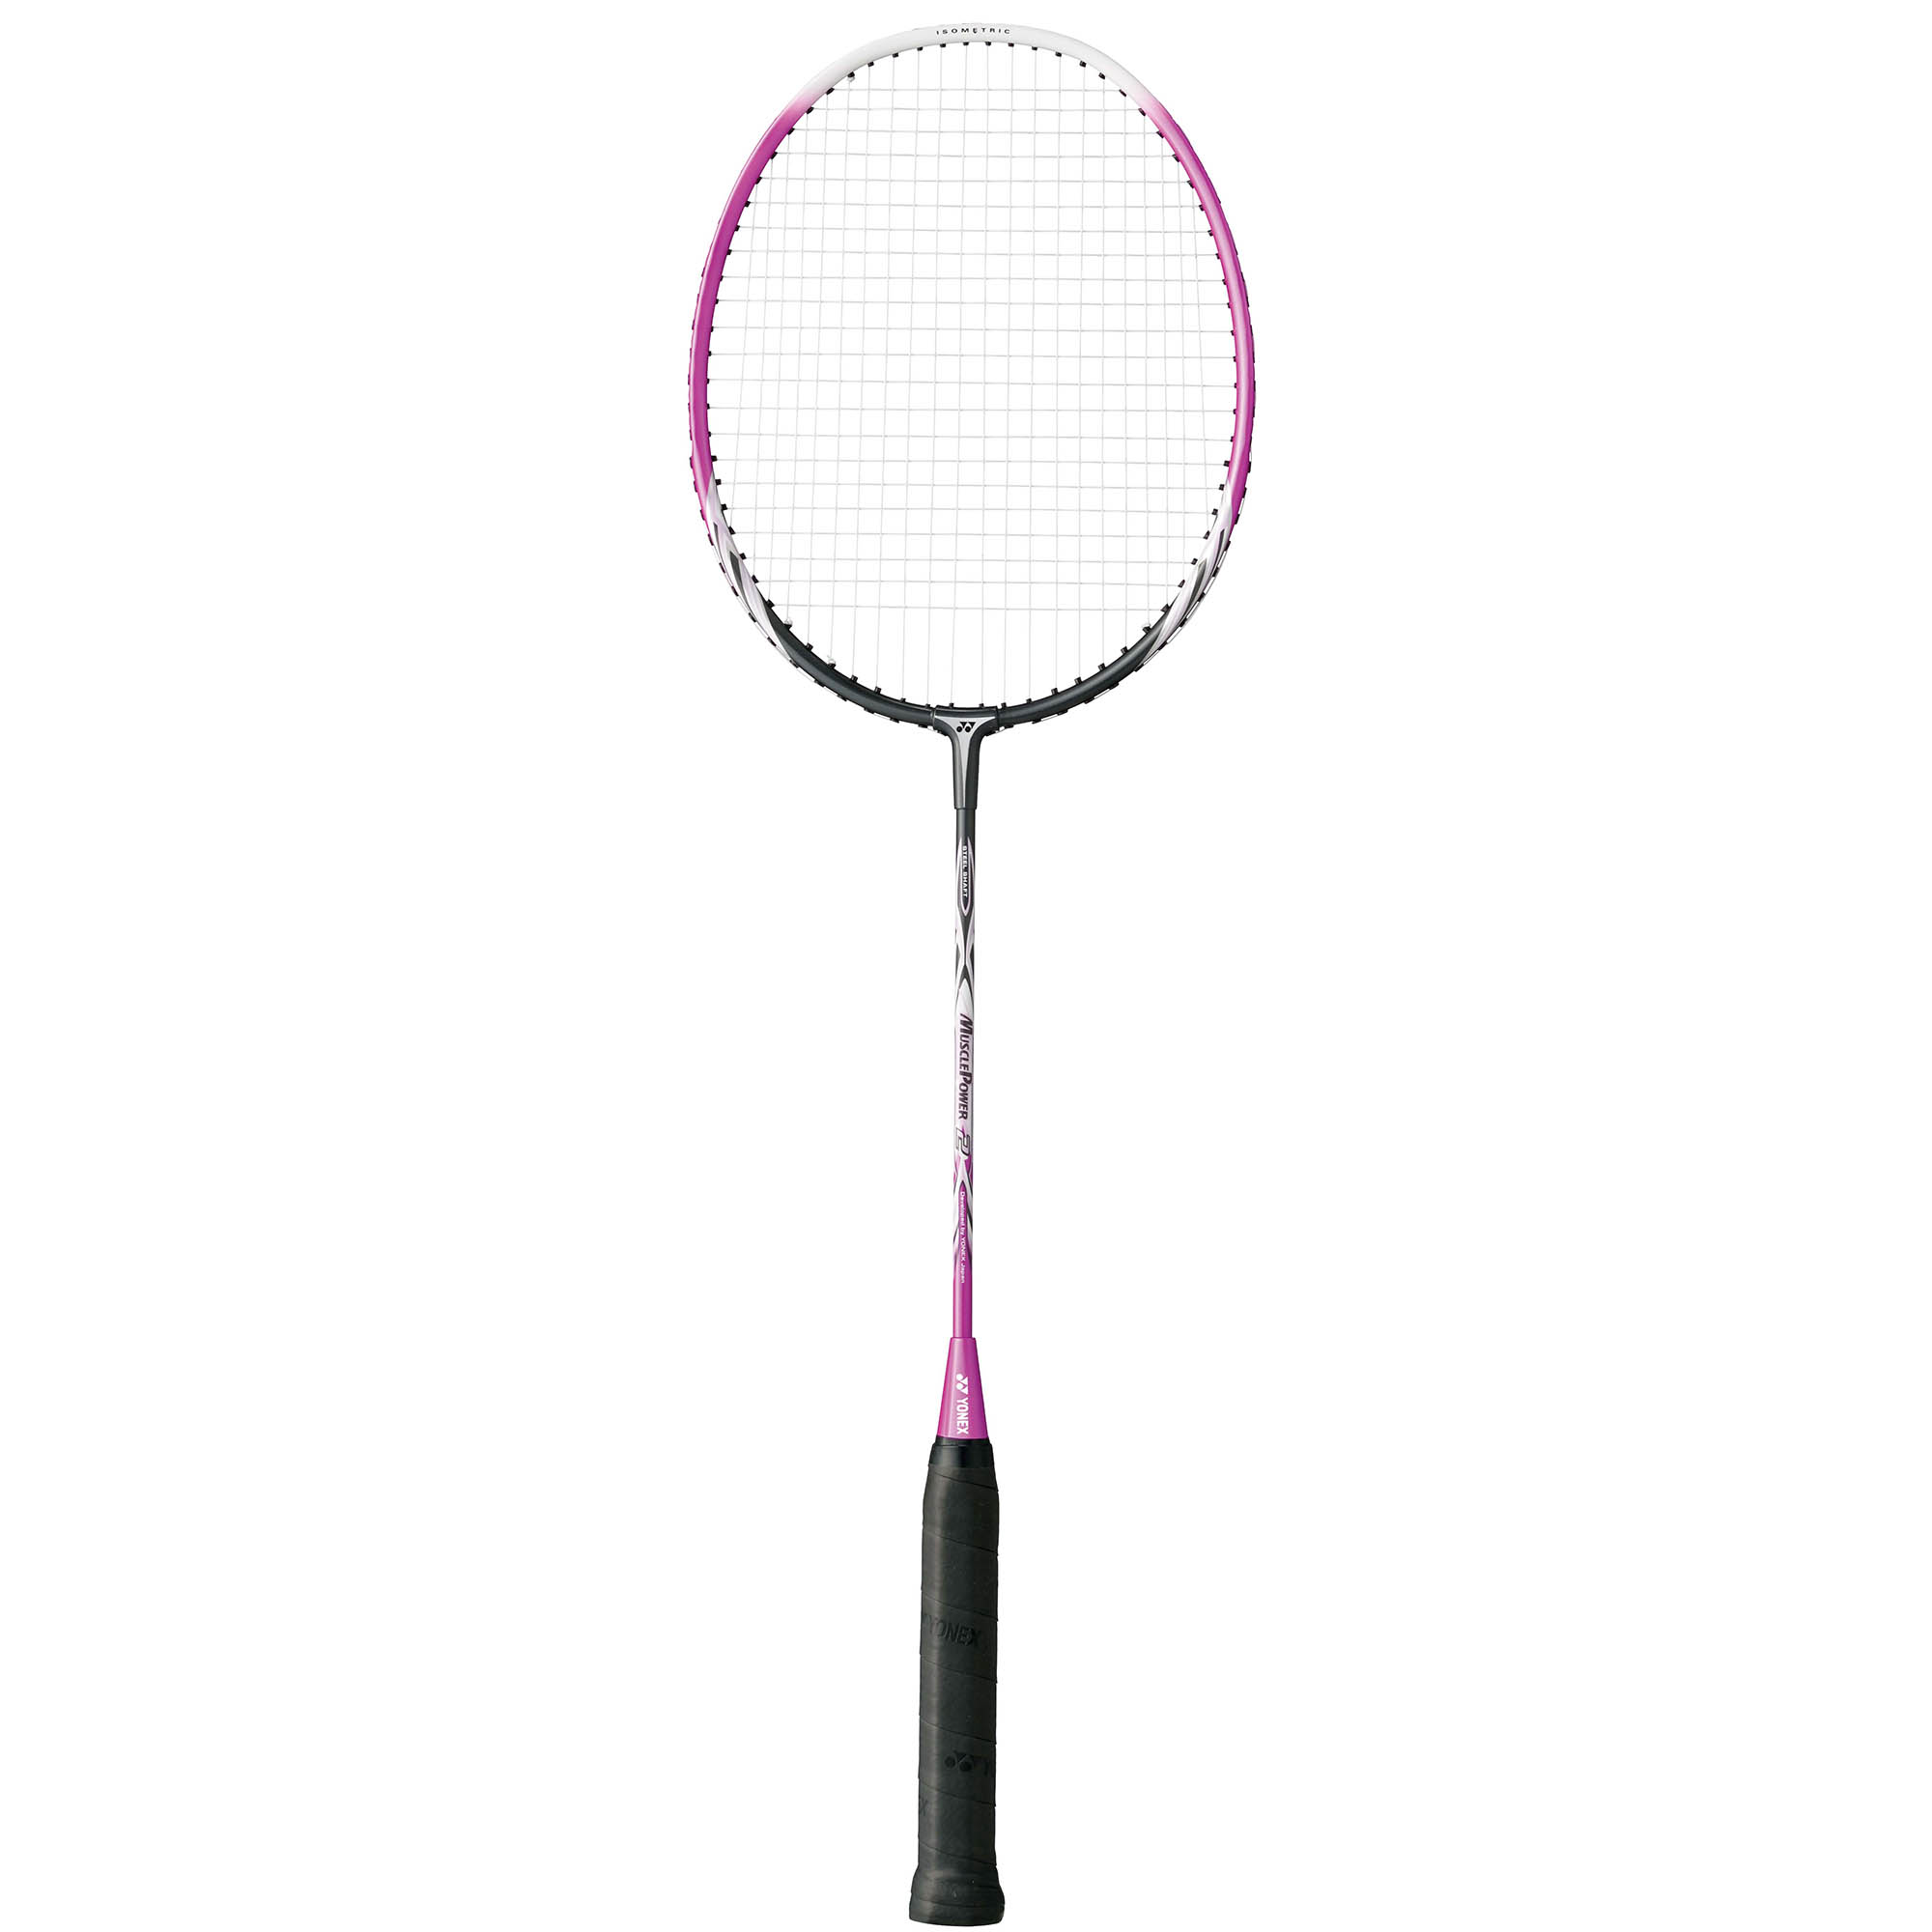 Yonex Muscle Power 2 Badminton Racket  BlackPink